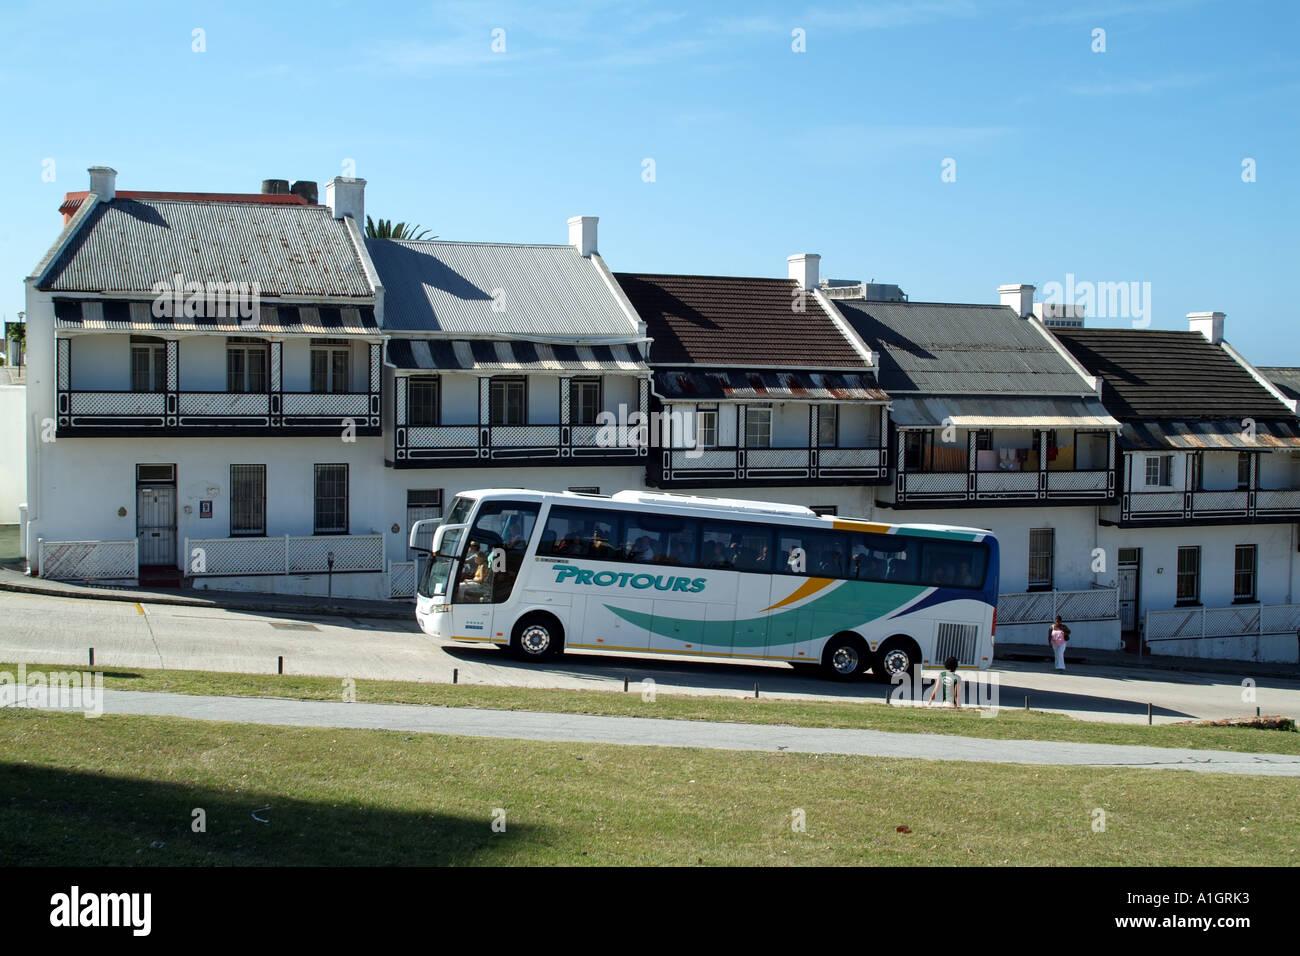 Port elizabeth eastern cape south africa rsa tourbus tour - Drive from port elizabeth to cape town ...